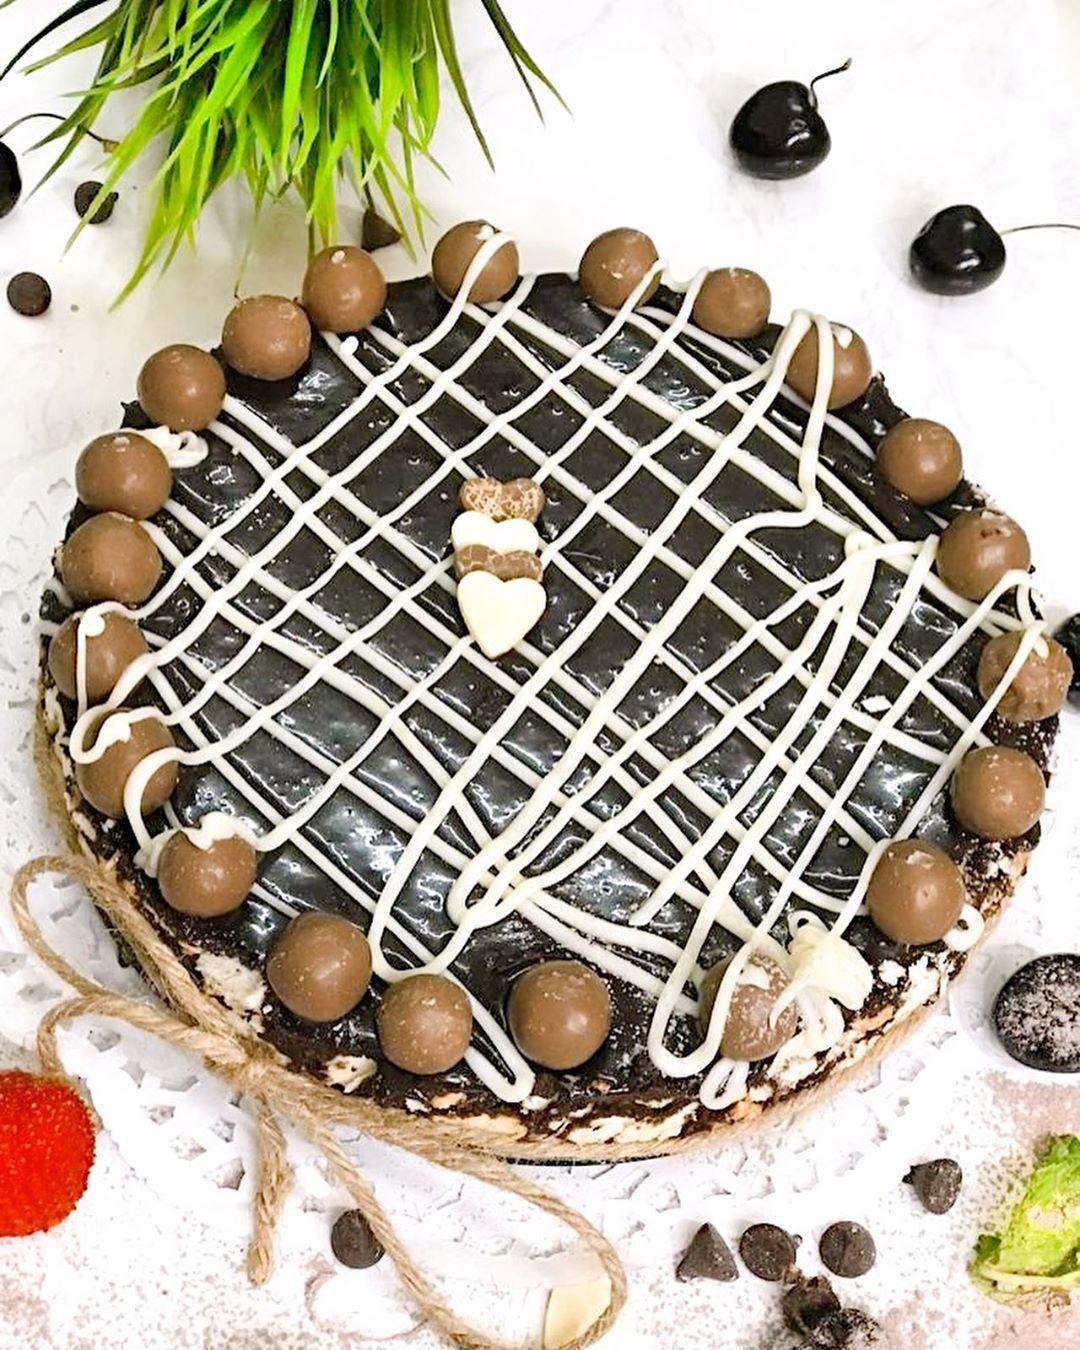 Thee Roro On Instagram No Bake Chocolate Biscuits Cake ليزي كيك او السوكسيه Lazycake Nobake Nobakedessert Nobakebiscuitcake ليزي كيك سوكسي Kitchener